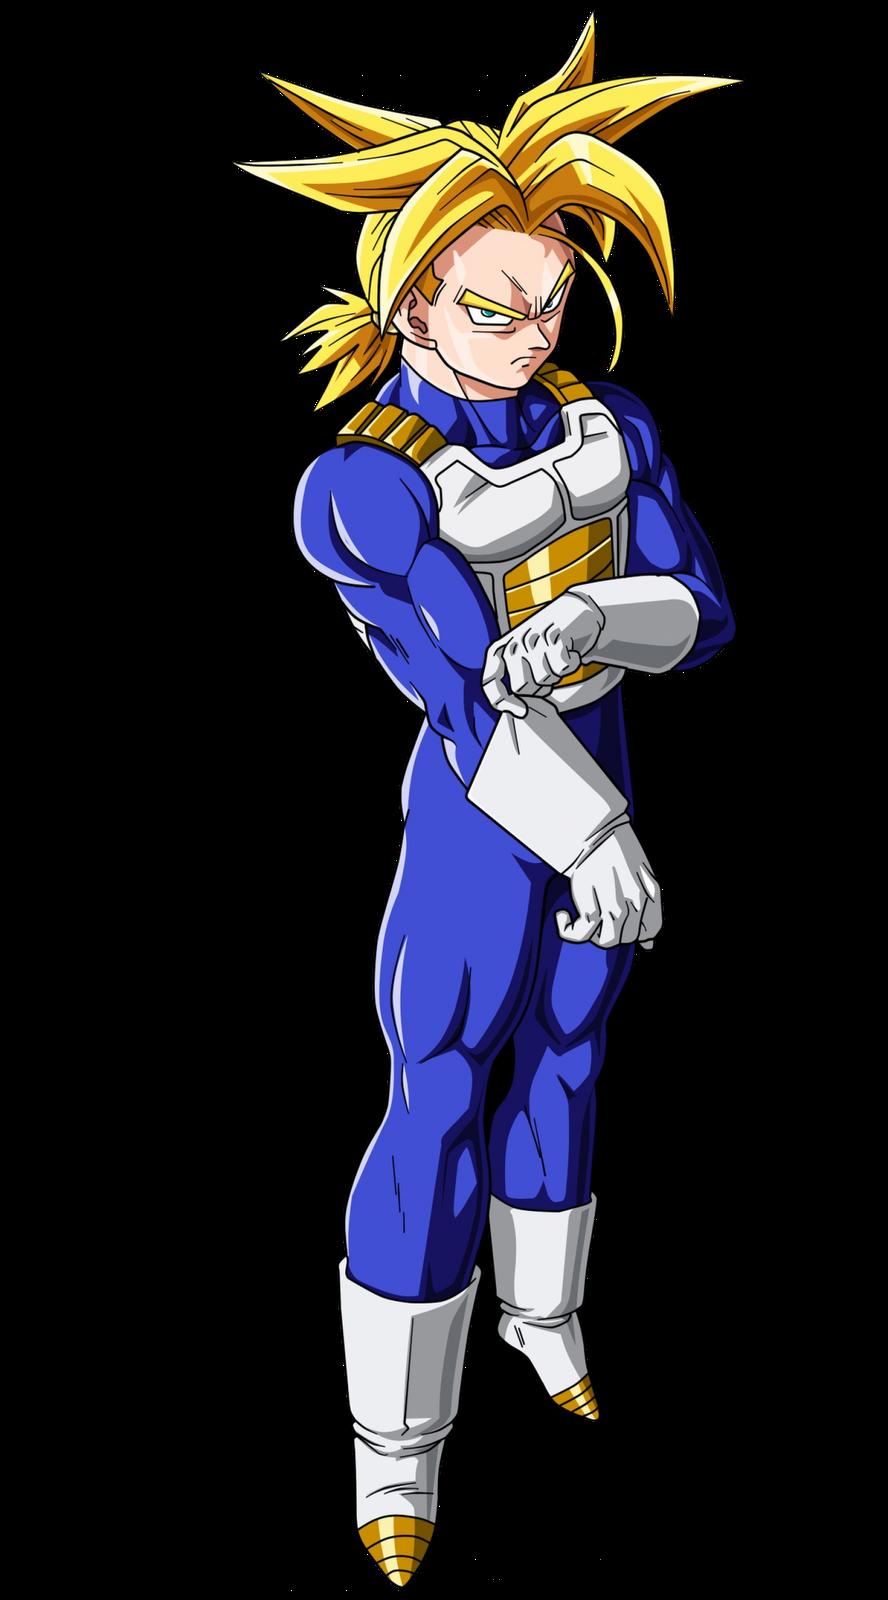 Vegeta And Trunks Signature Request Anime Forum Anime Discord